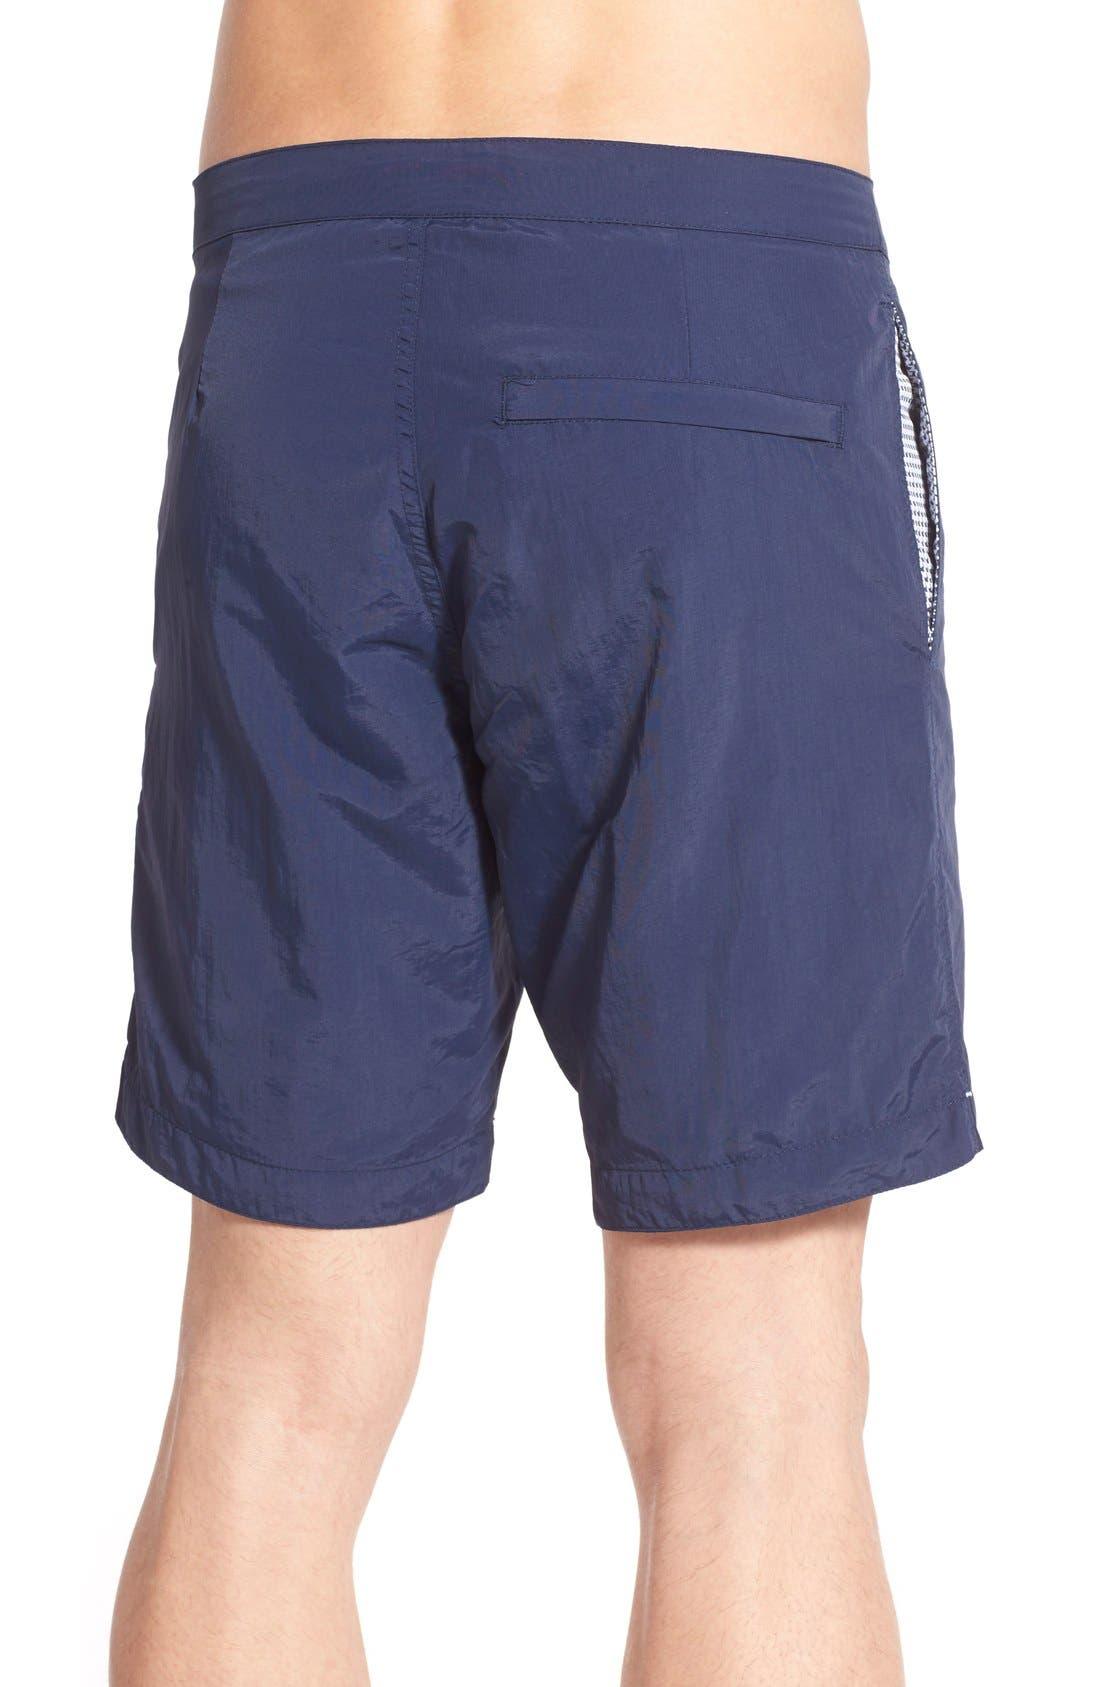 Aruba Tailored Fit 8.5 Inch Swim Trunks,                             Alternate thumbnail 7, color,                             415